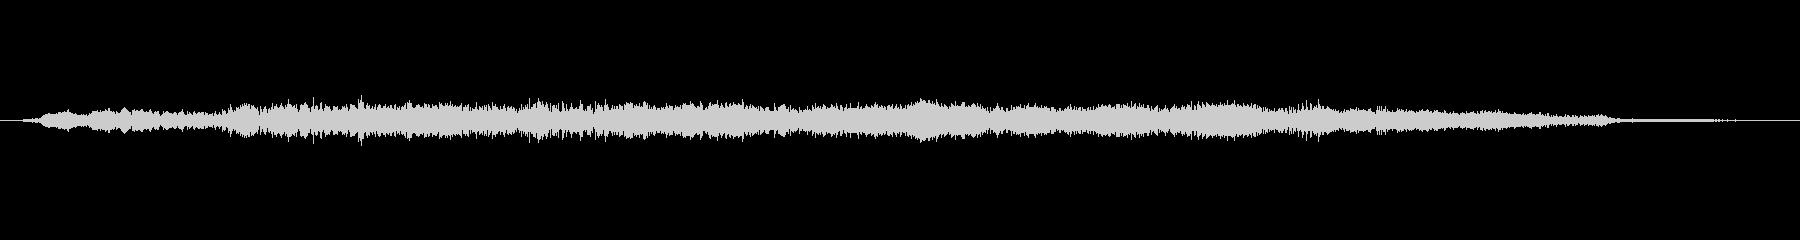 WASH TONES W / CR...の未再生の波形